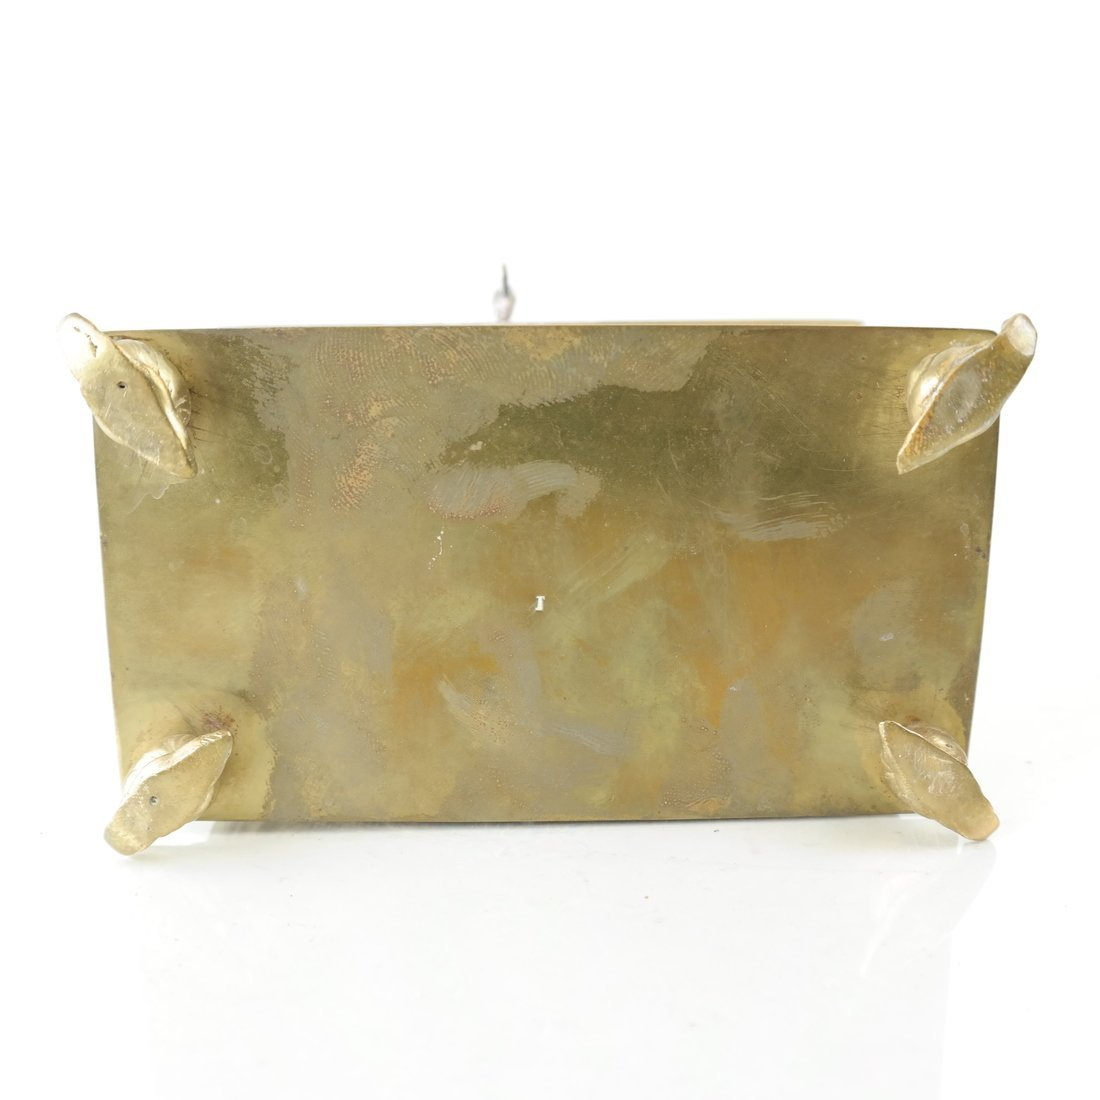 Ornate Casket Form Box - 8